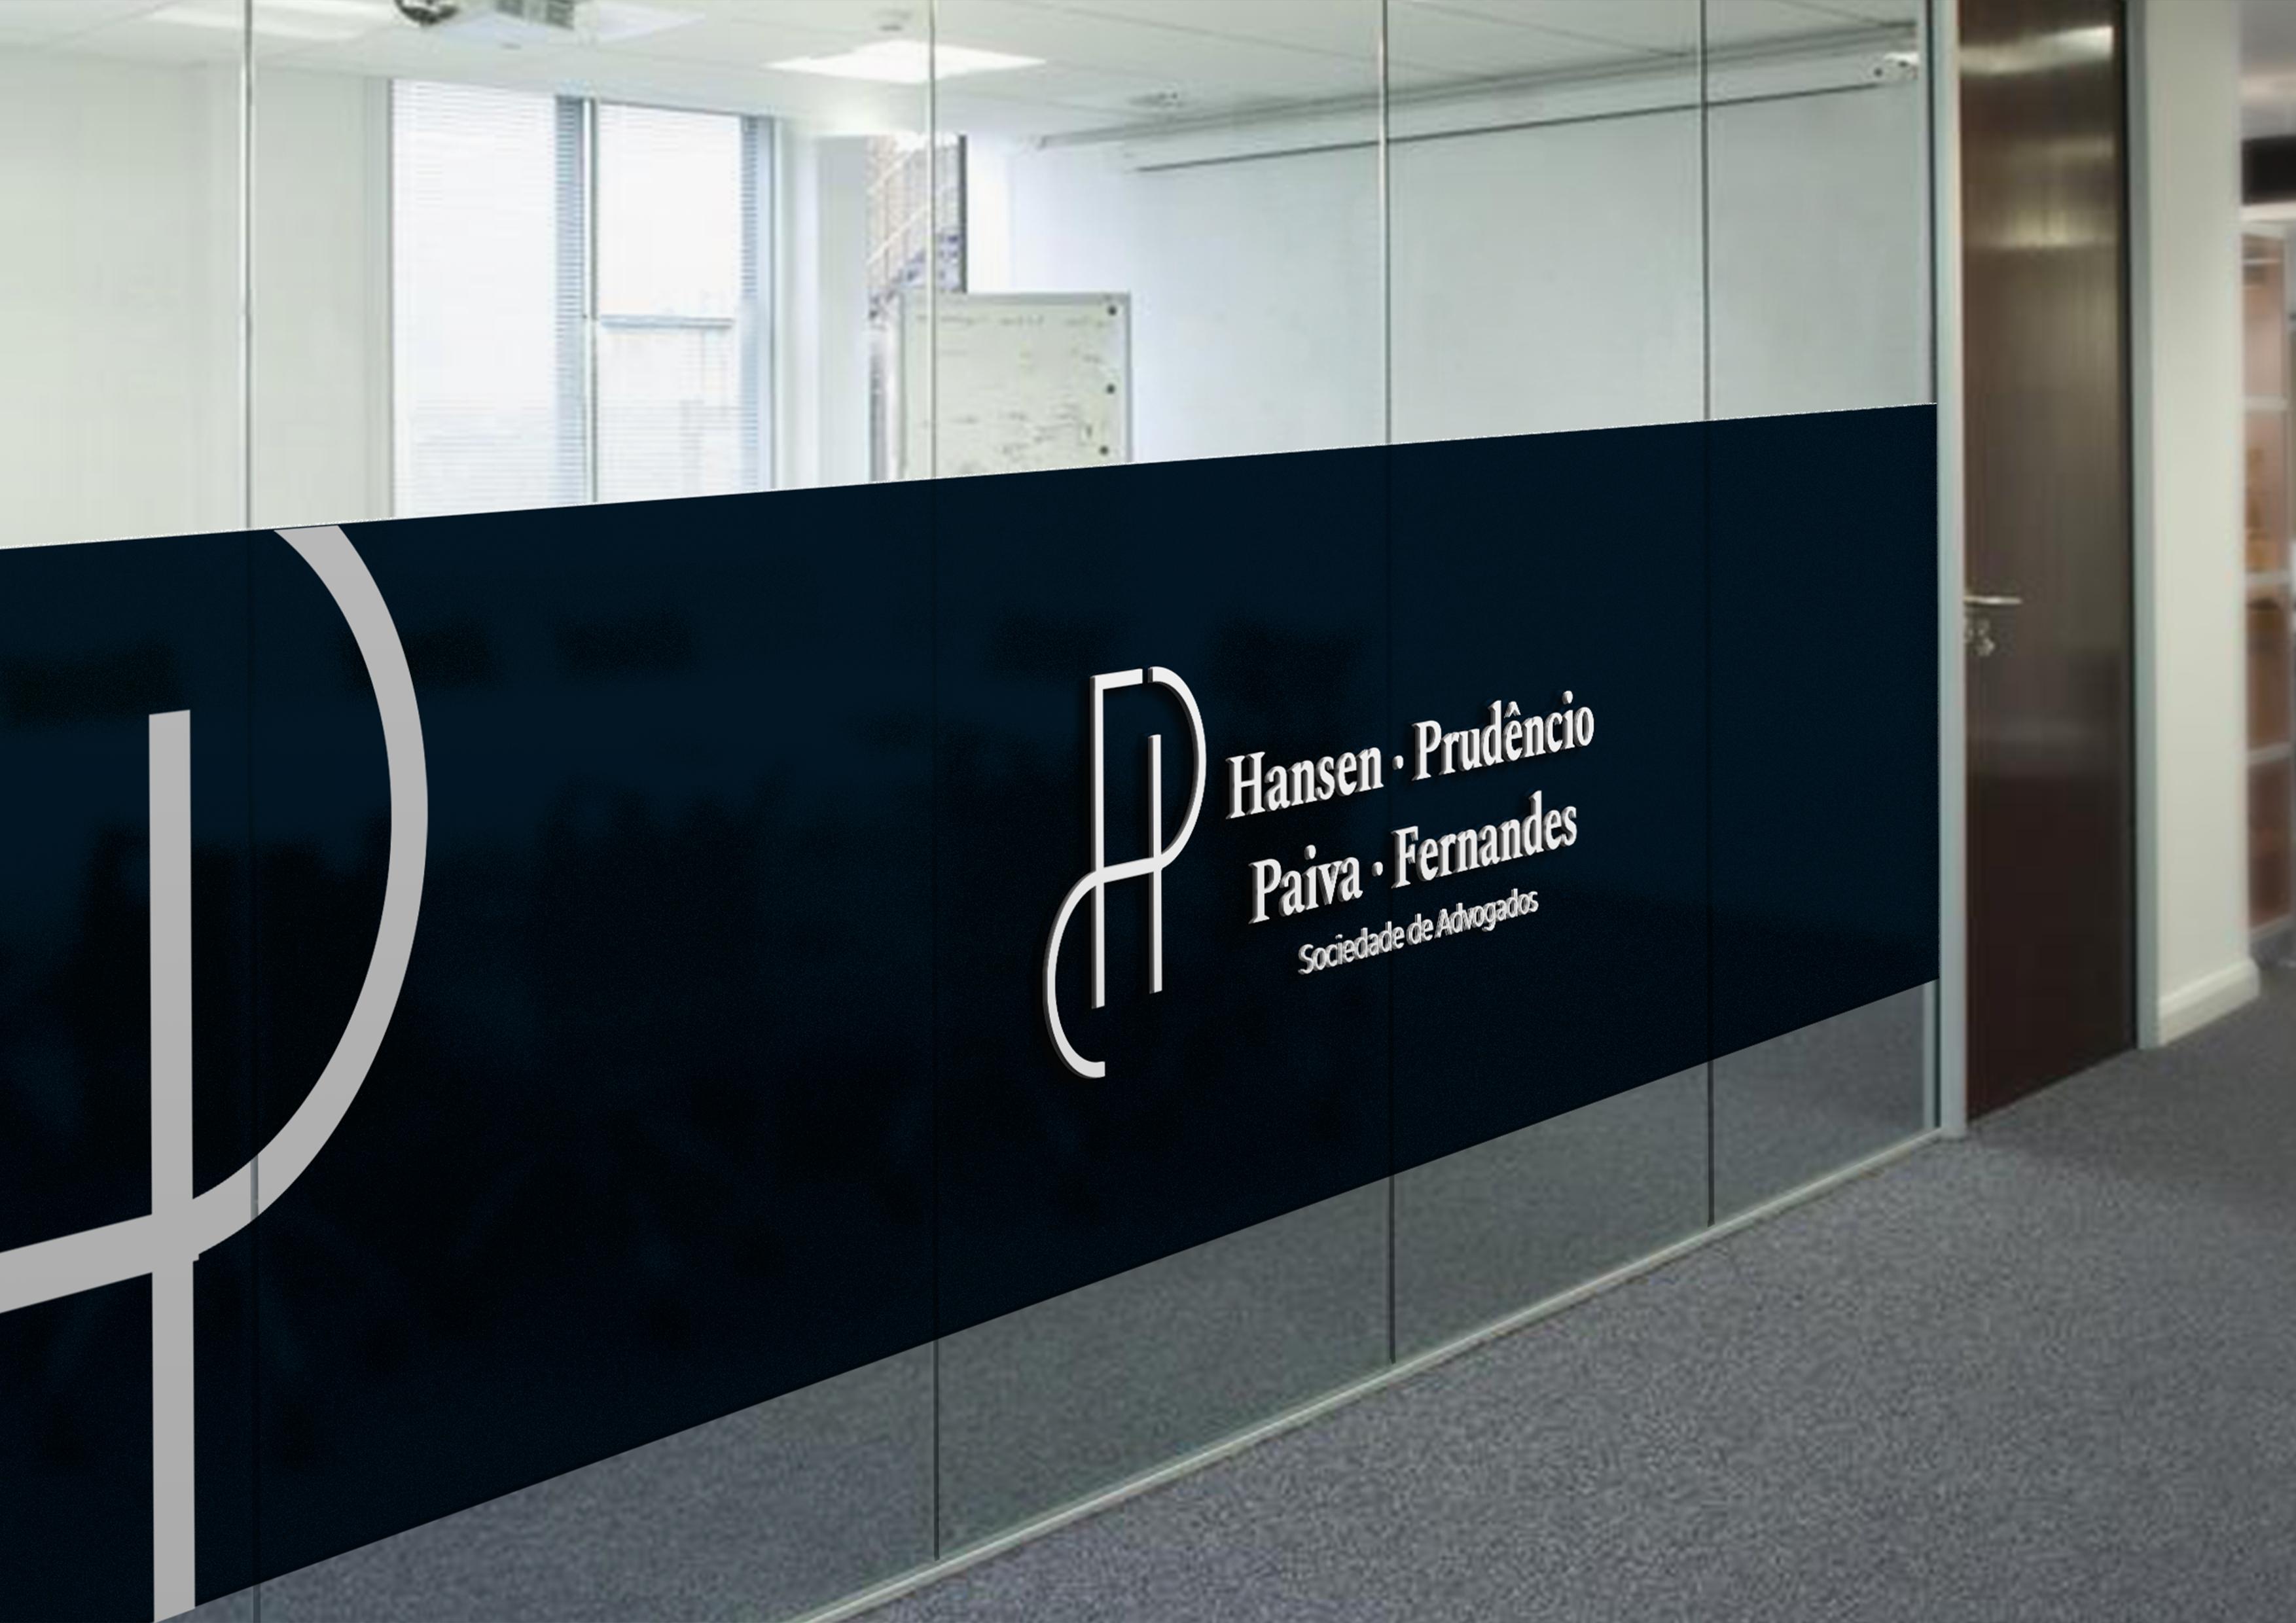 Hansen, Prudêncio, Paiva & Fernandes Sociedade de Advogados